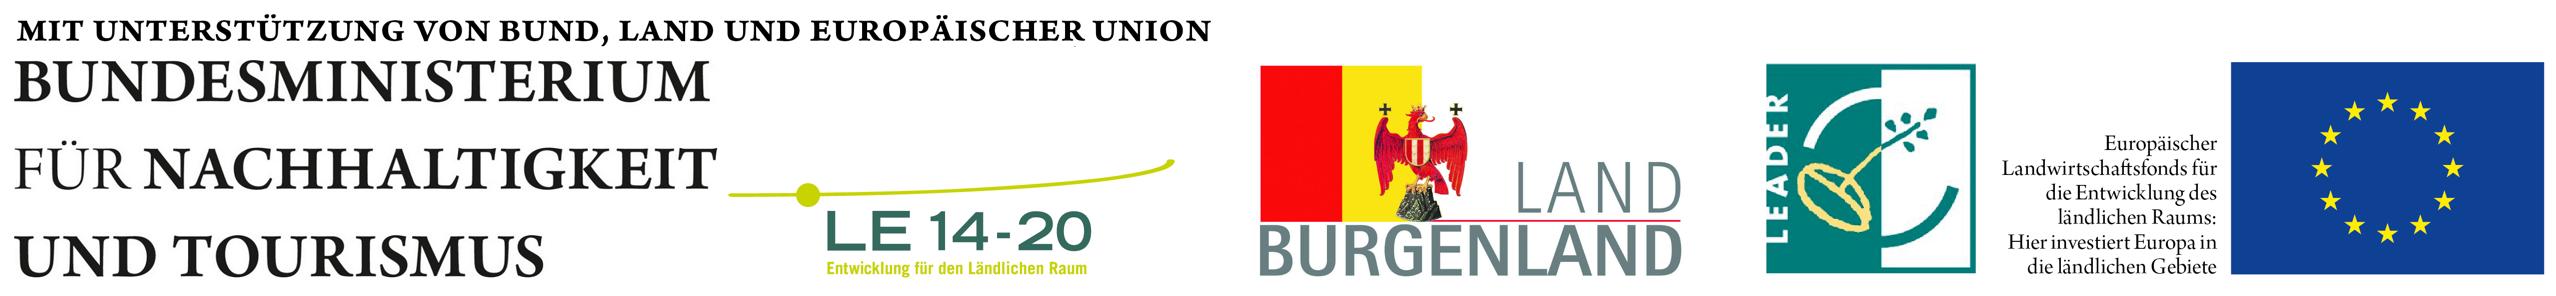 4.2_c_BM_LLogo_EU_LEADER_Land_2015_RGB_fin